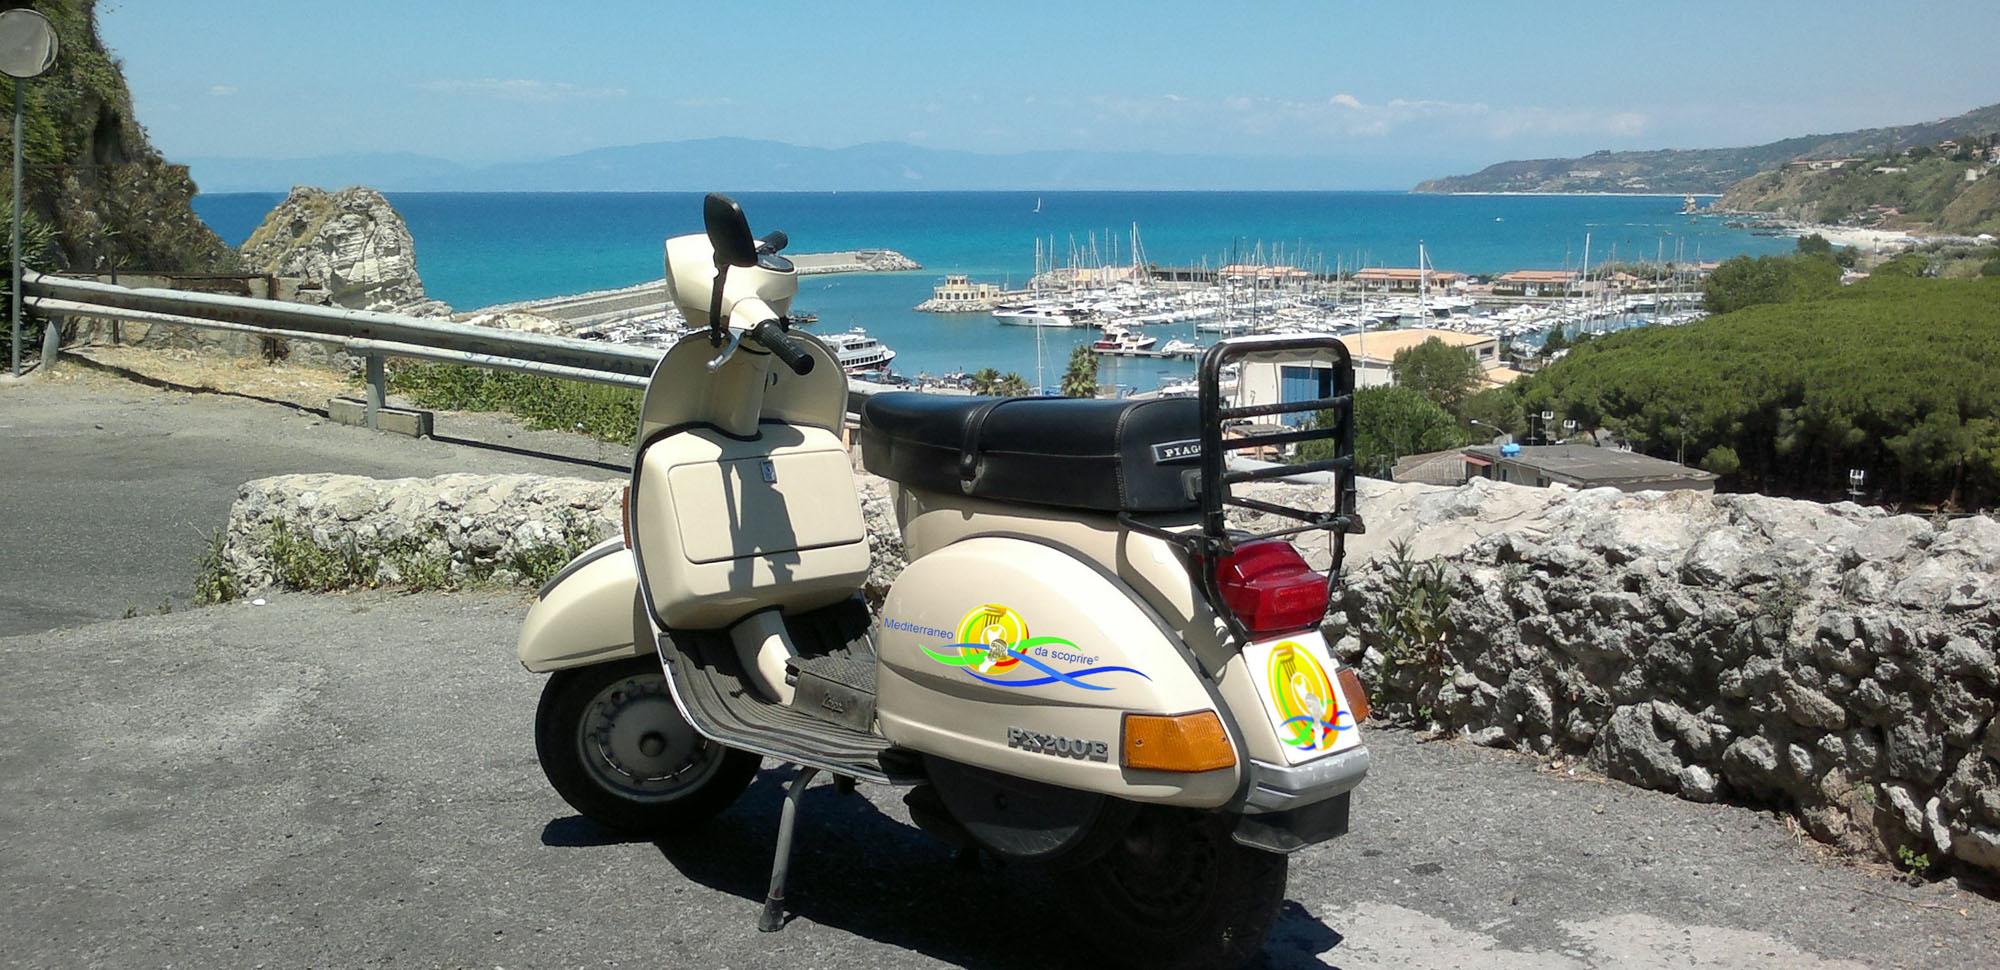 Mediterraneo da scoprire, Tropea-Parghelia